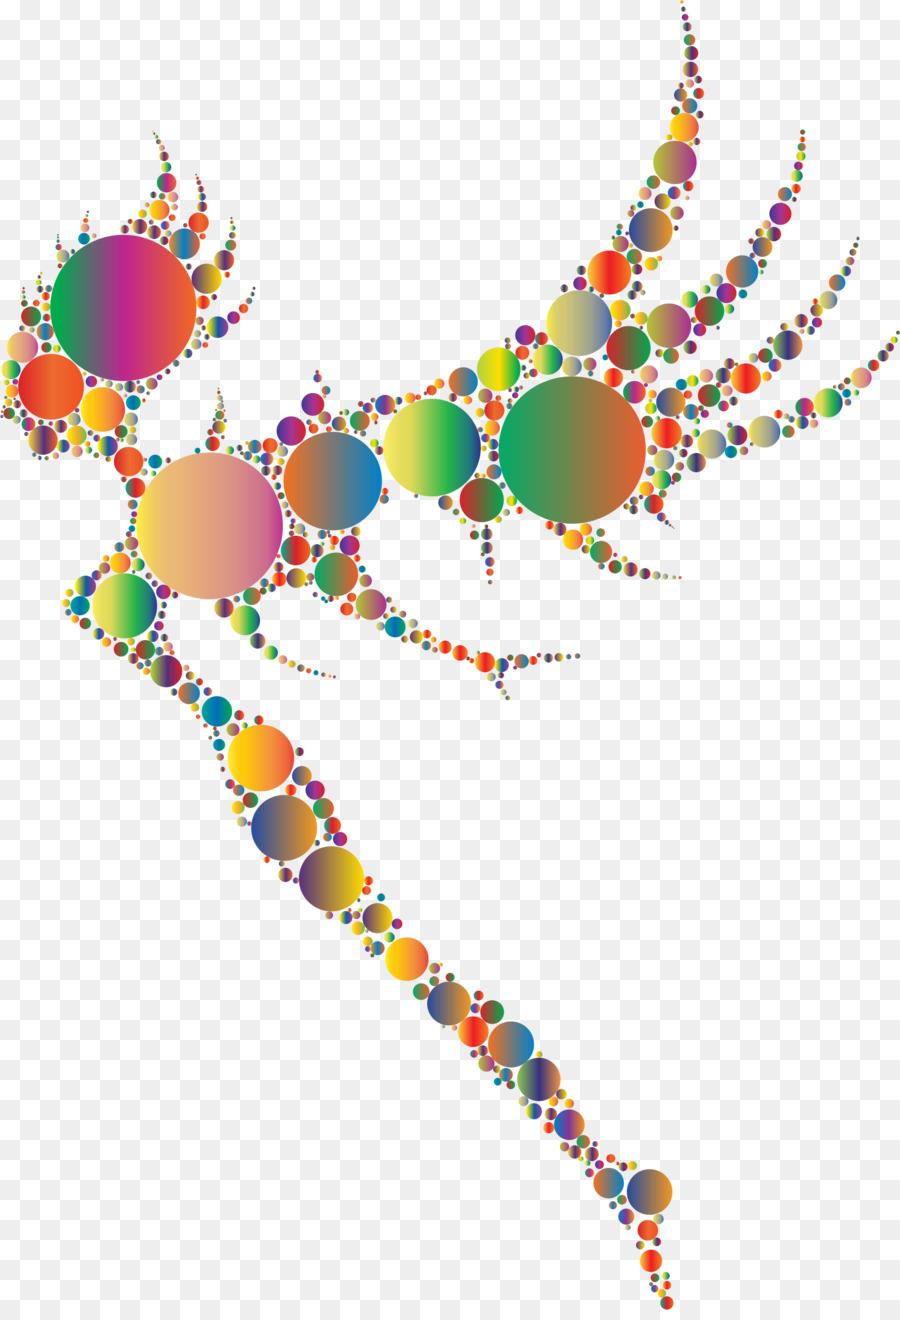 Fairy Clip Art - Channing Tatum-Fairy Clip art - channing tatum-14